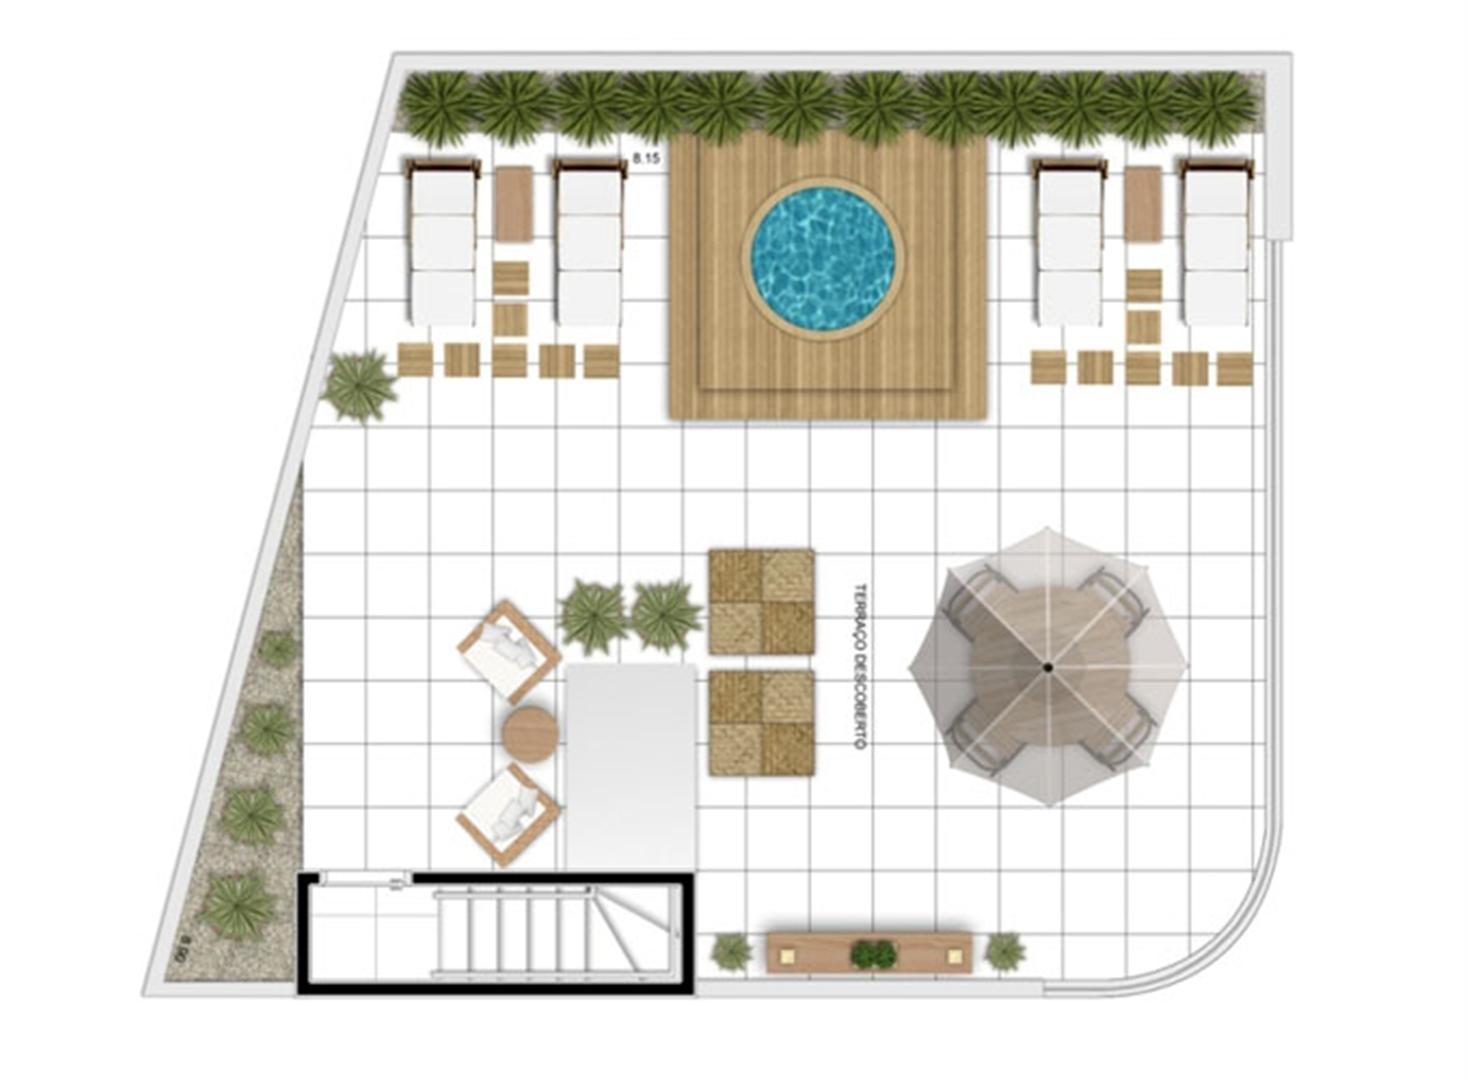 PLANTA - APTO TIPO A - 166 m² DUPLEX SUPERIOR  | In Mare Bali – Apartamento no  Distrito Litoral de Cotovelo - Parnamirim - Rio Grande do Norte